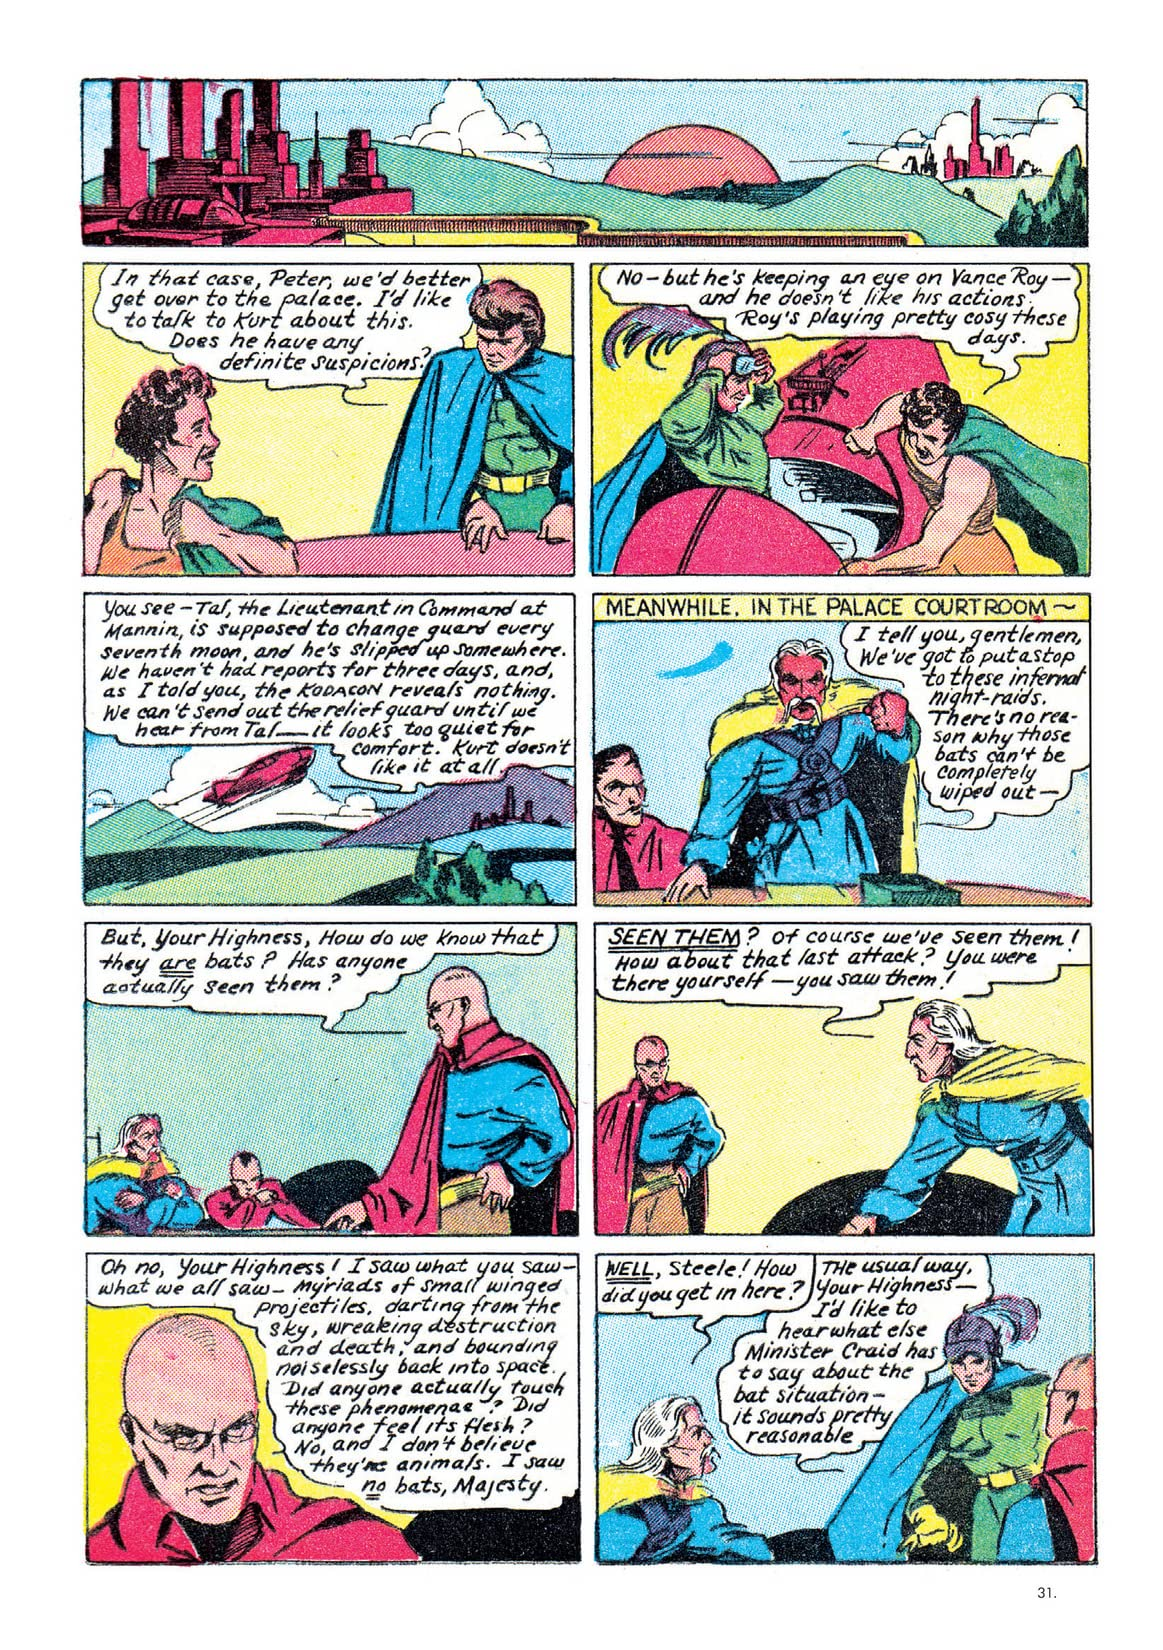 Amazing Mysteries: Bill Everett Archives Vol. 1